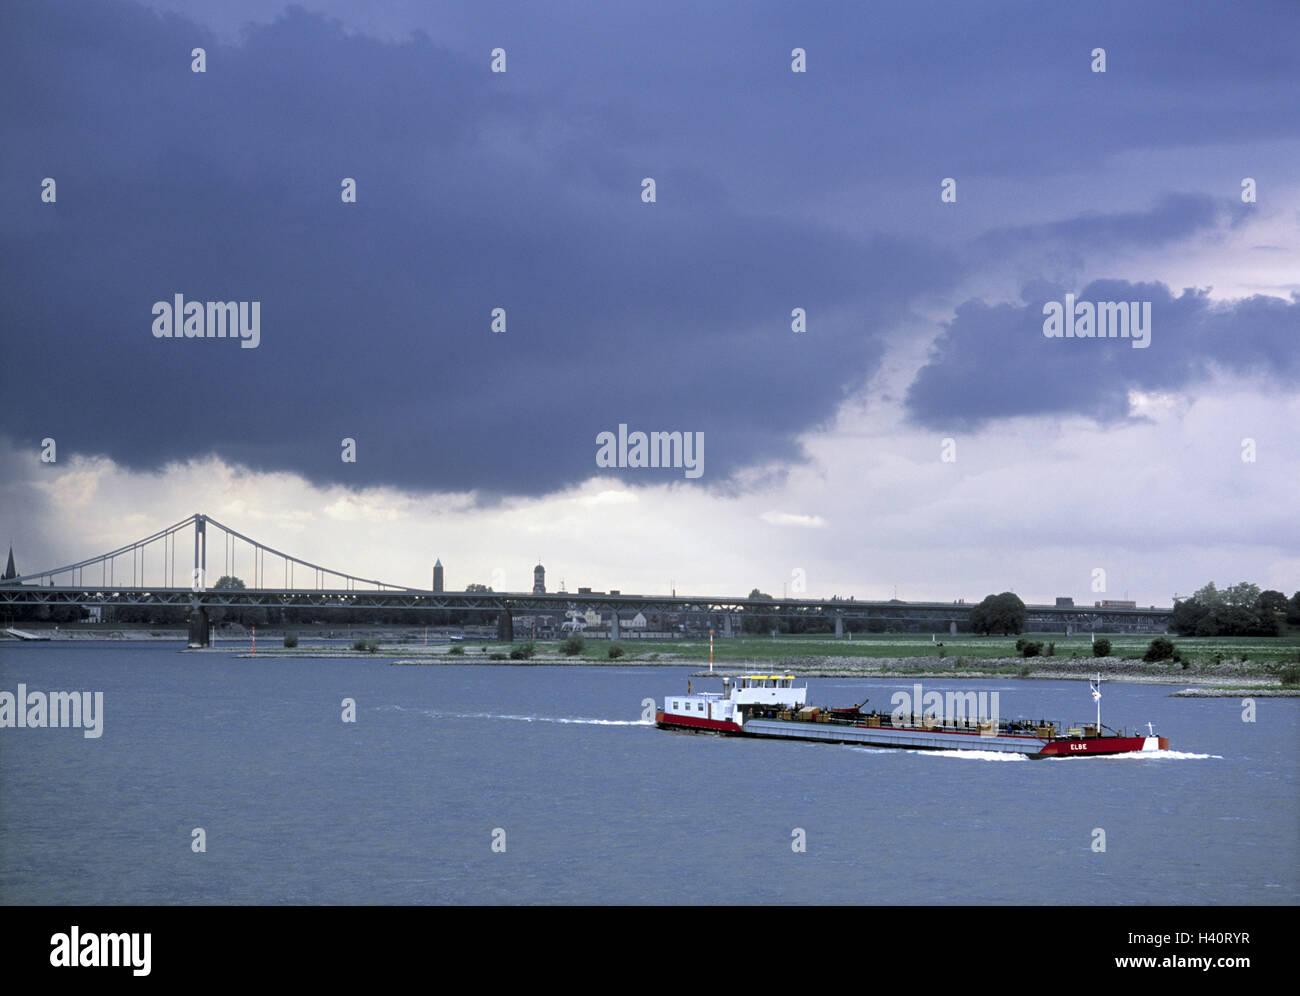 Germany, North Rhine-Westphalia, Rhine bridge, connection, Krefeld, Uerdingen, freighter, Europe, dysentery area, - Stock Image